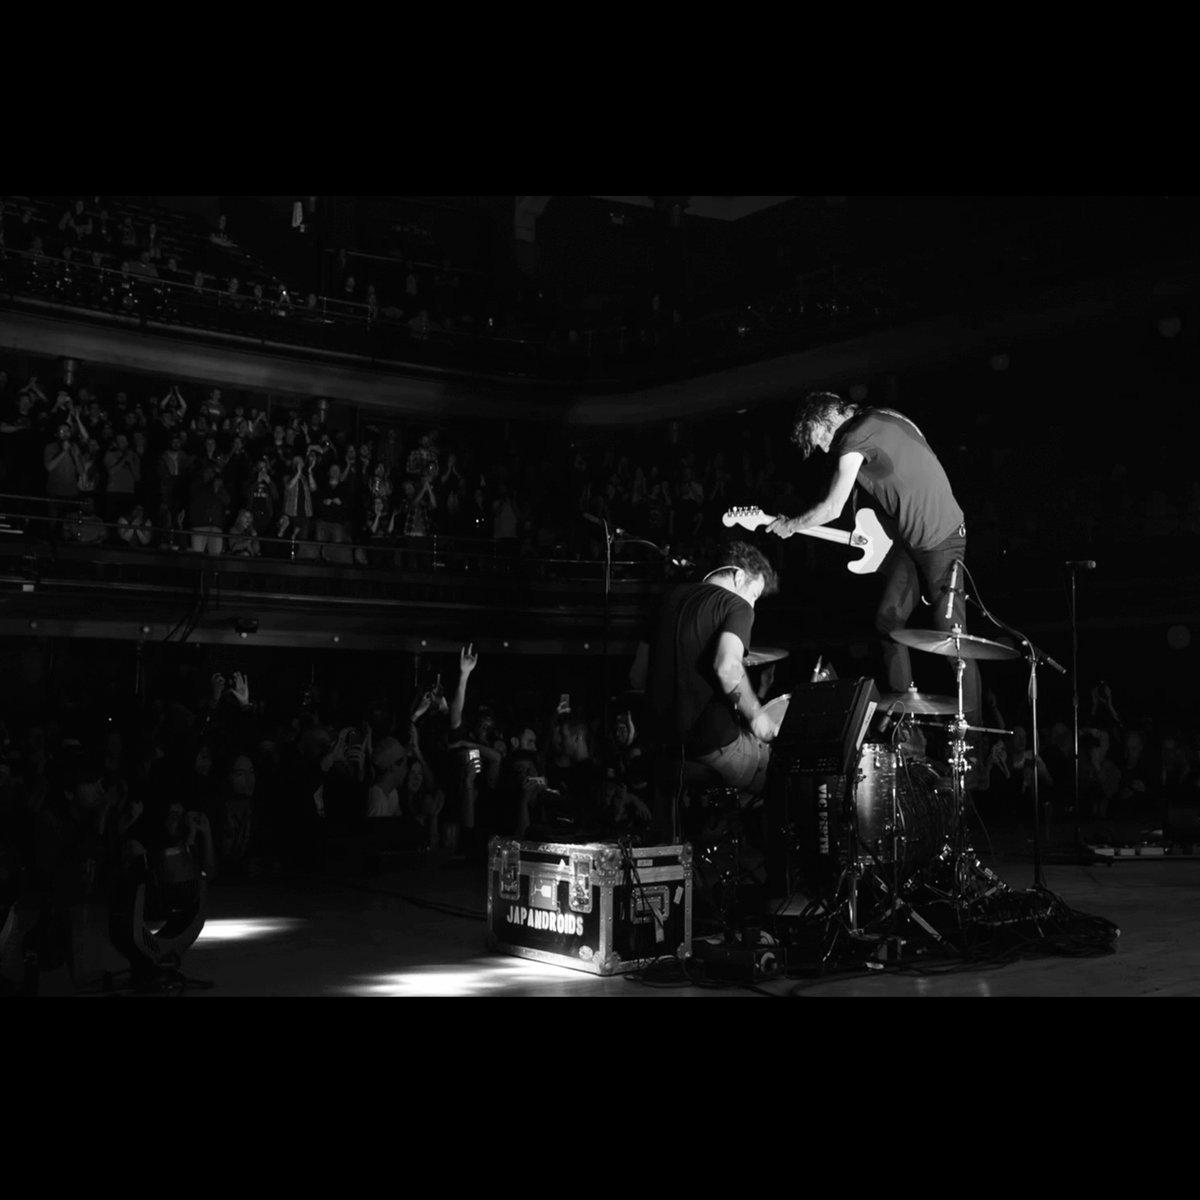 Japandroids - Massey Fucking Hall [2xLP]